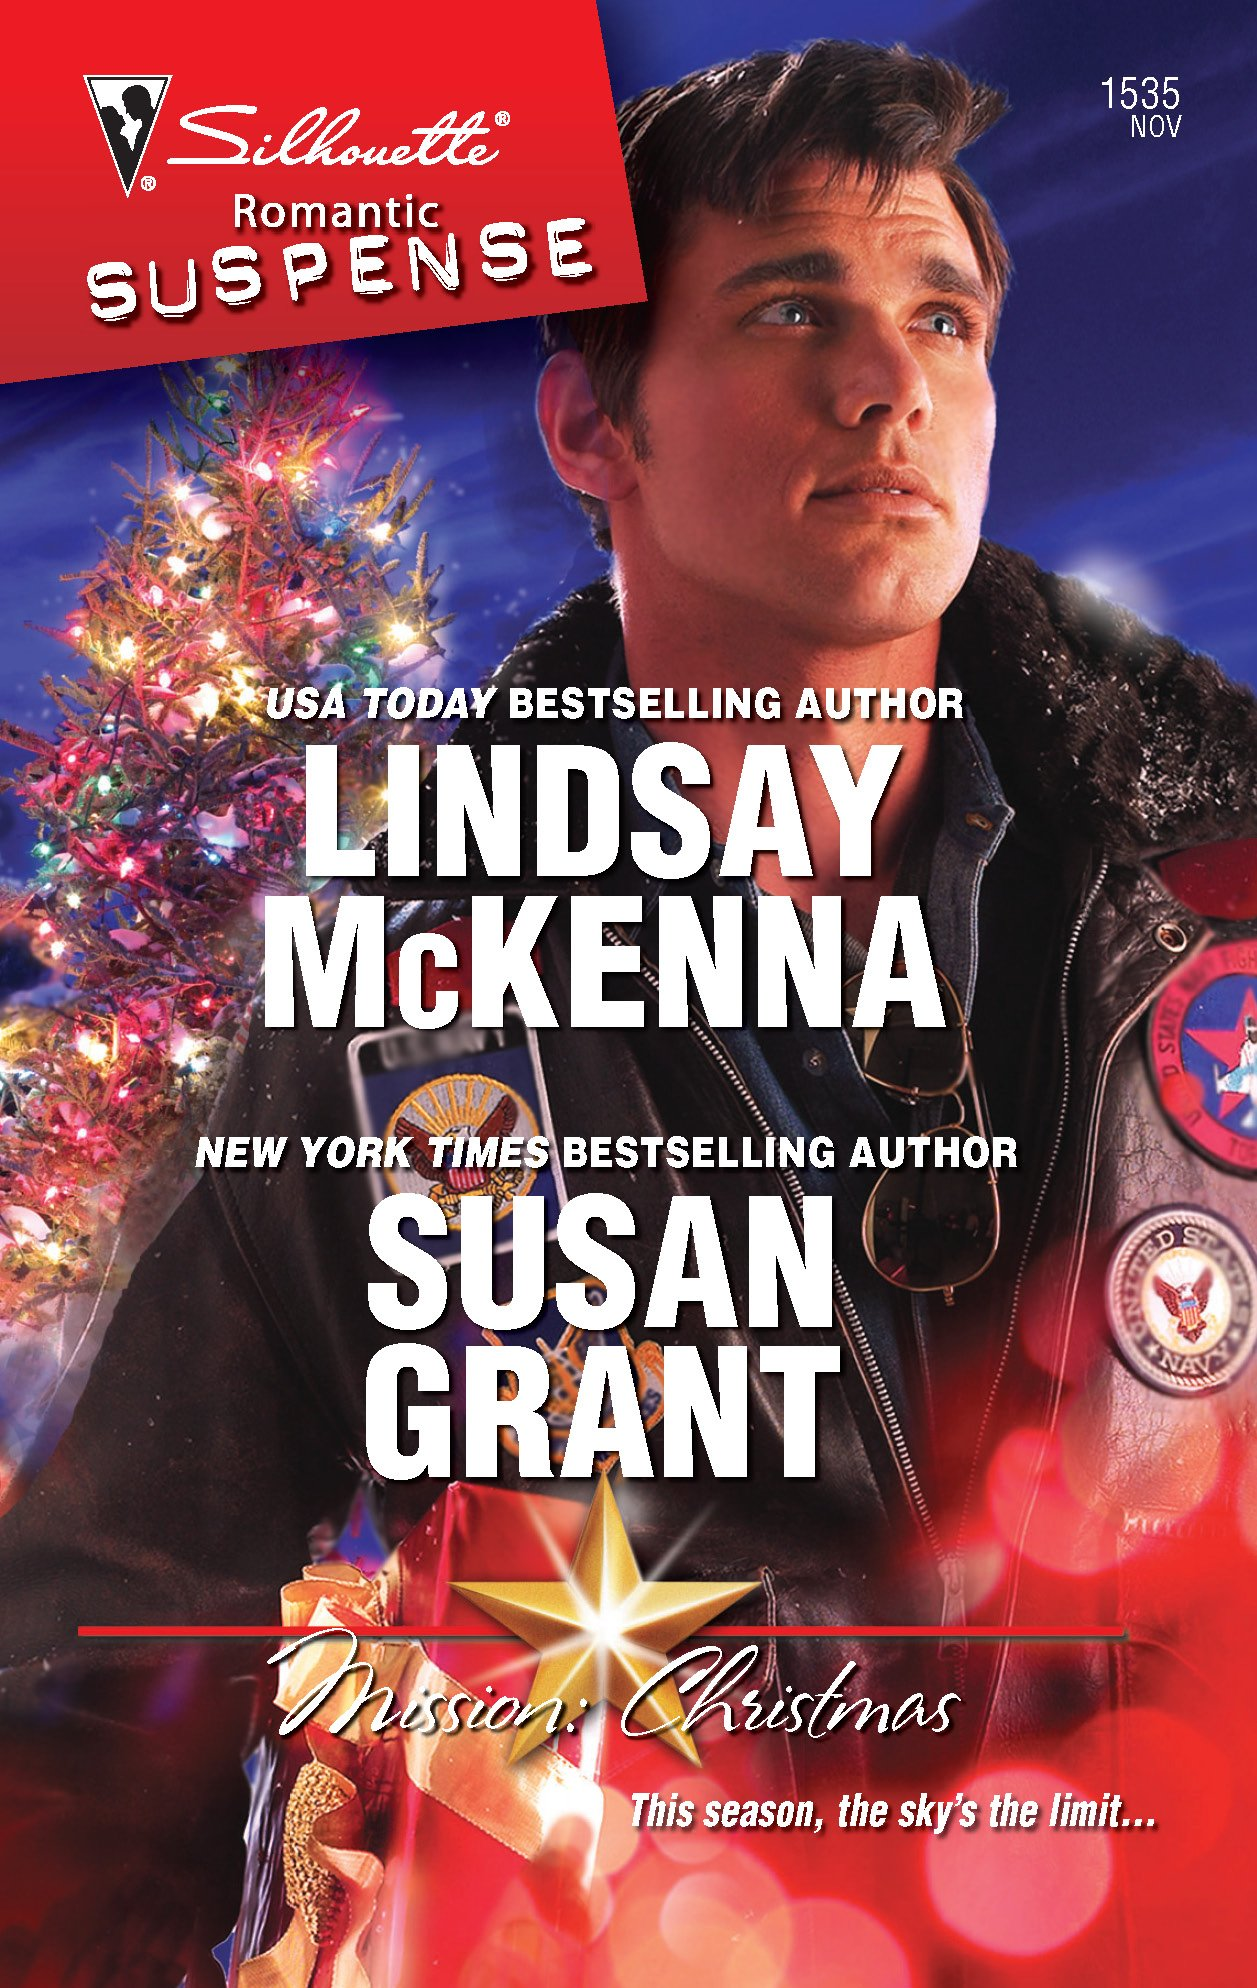 Download Mission: Christmas (Silhouette Romantic Suspense) ebook